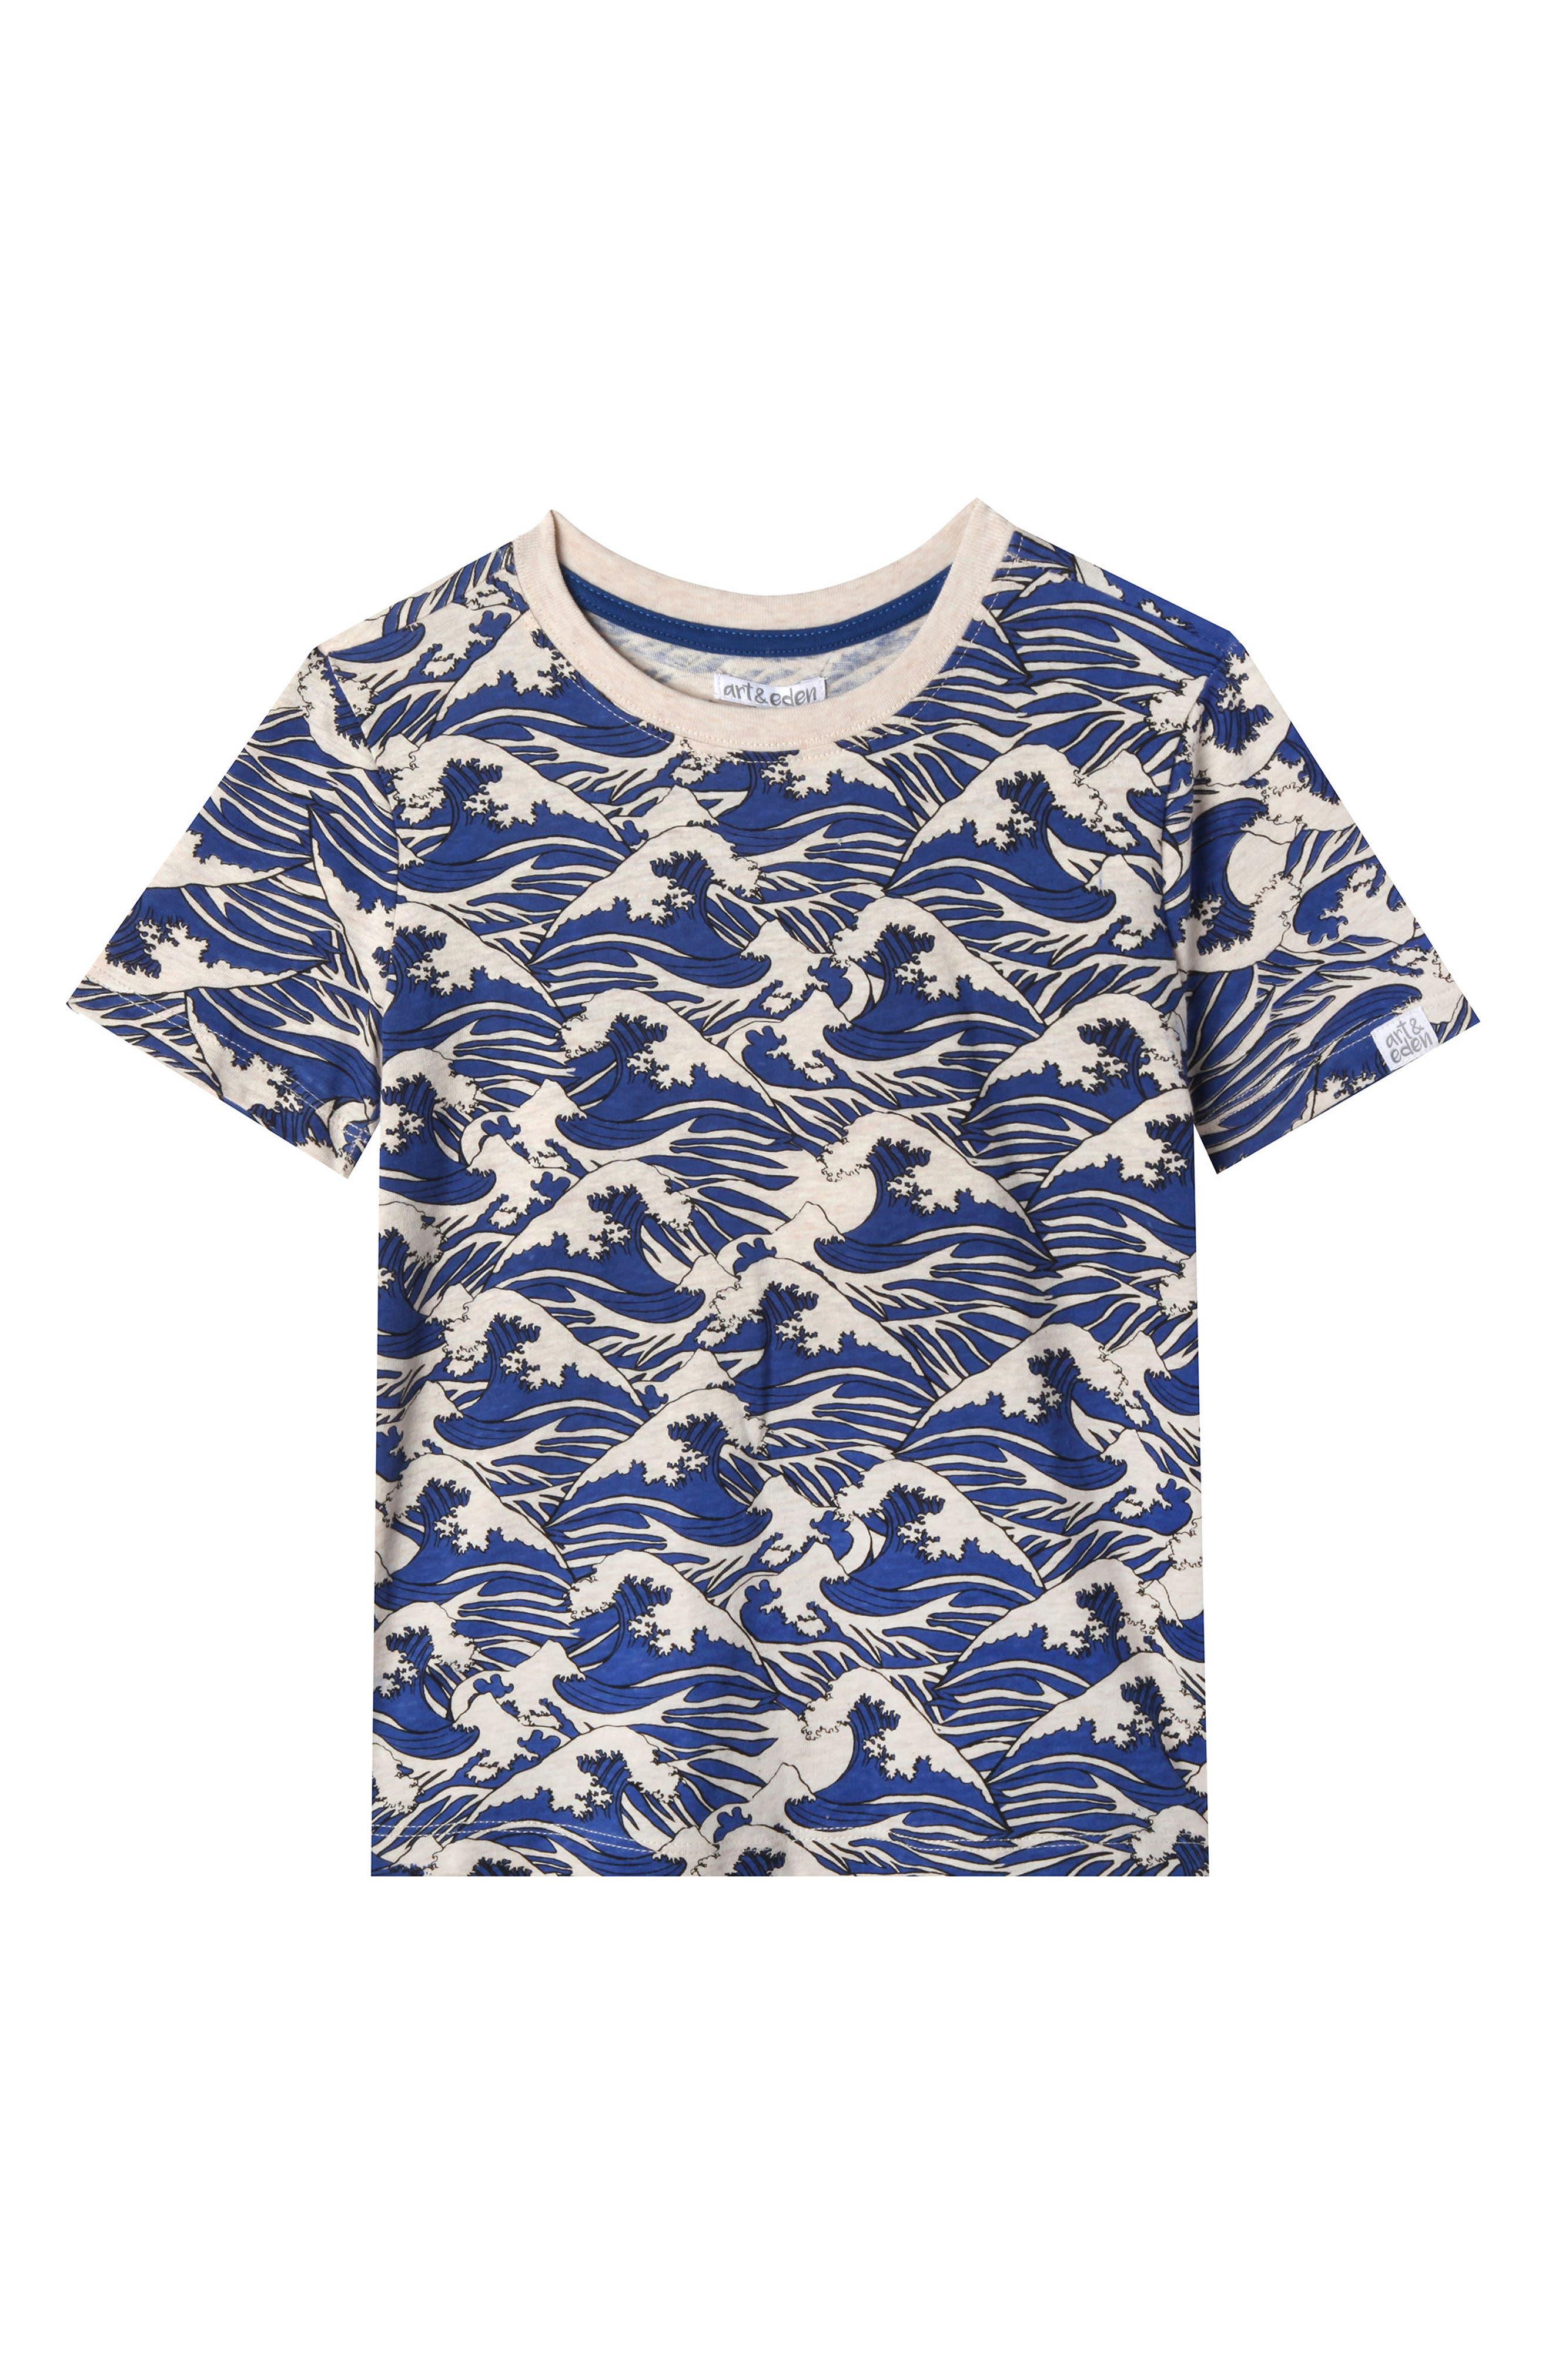 David Ocean Waves Organic Cotton T-Shirt,                         Main,                         color, 260